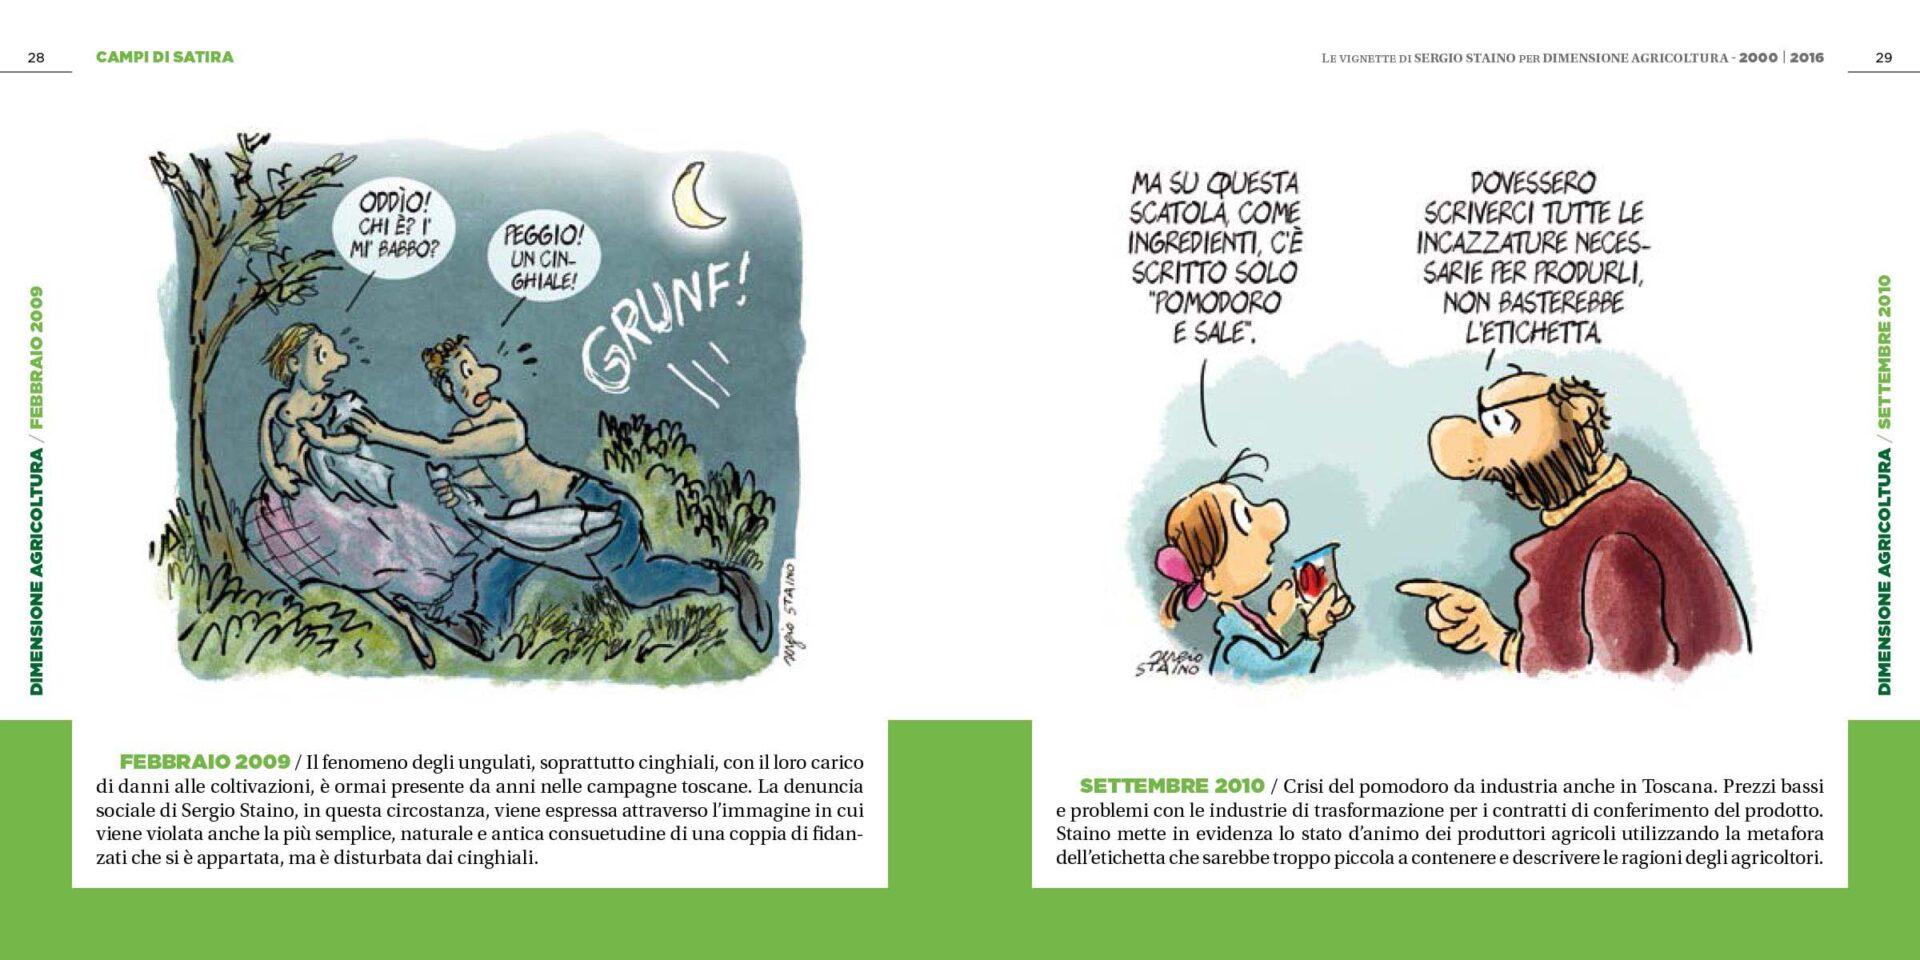 alfiotondelli_portfolio_campi-di-satira_28-29